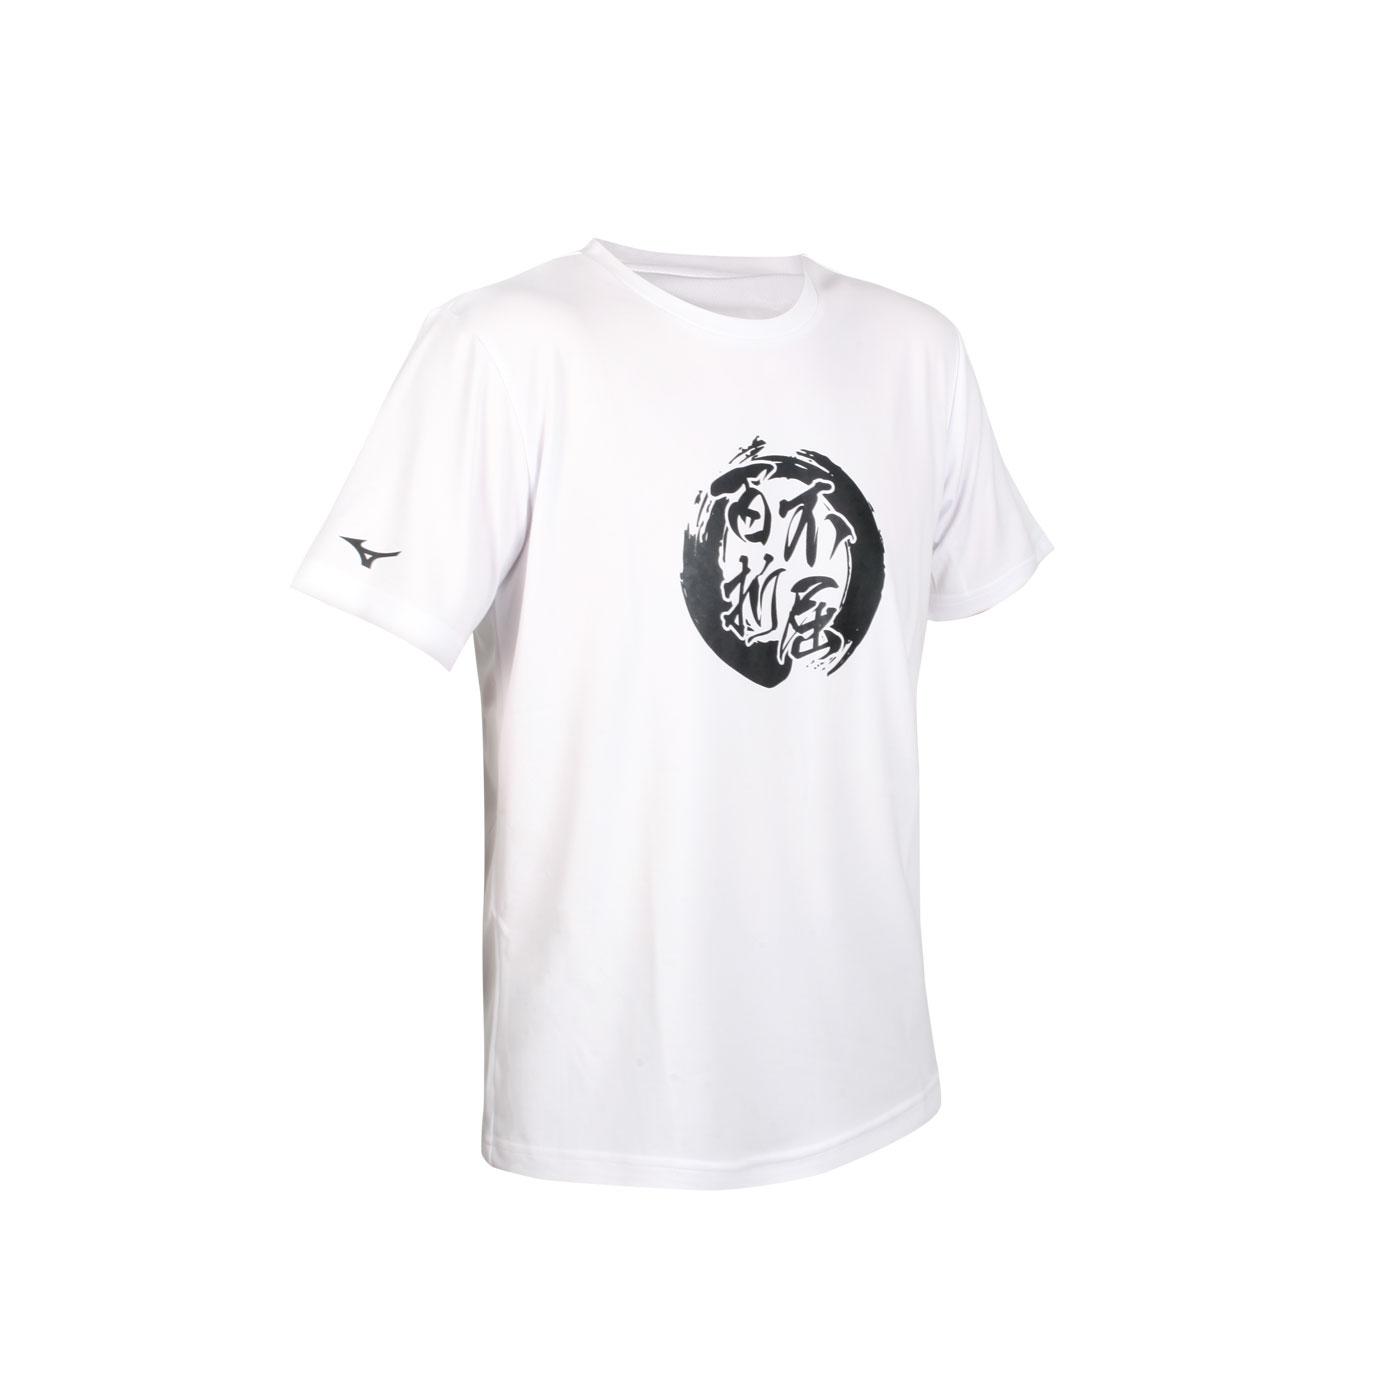 MIZUNO 男款短袖T恤 32TA101101 - 白黑